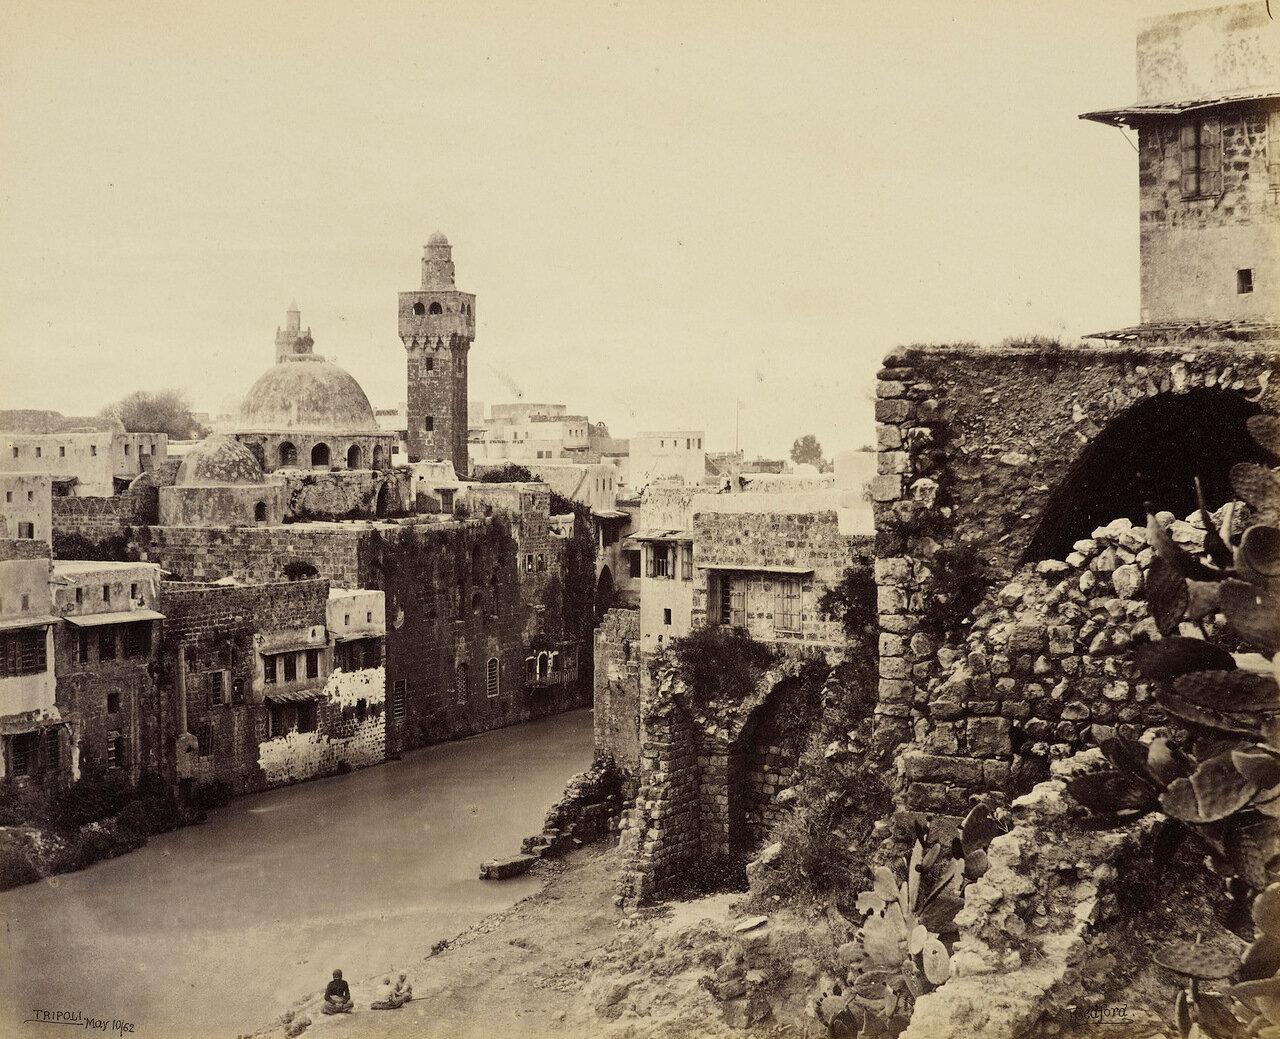 10 мая 1862. Вид Триполи. Река Кадиша, Ливан